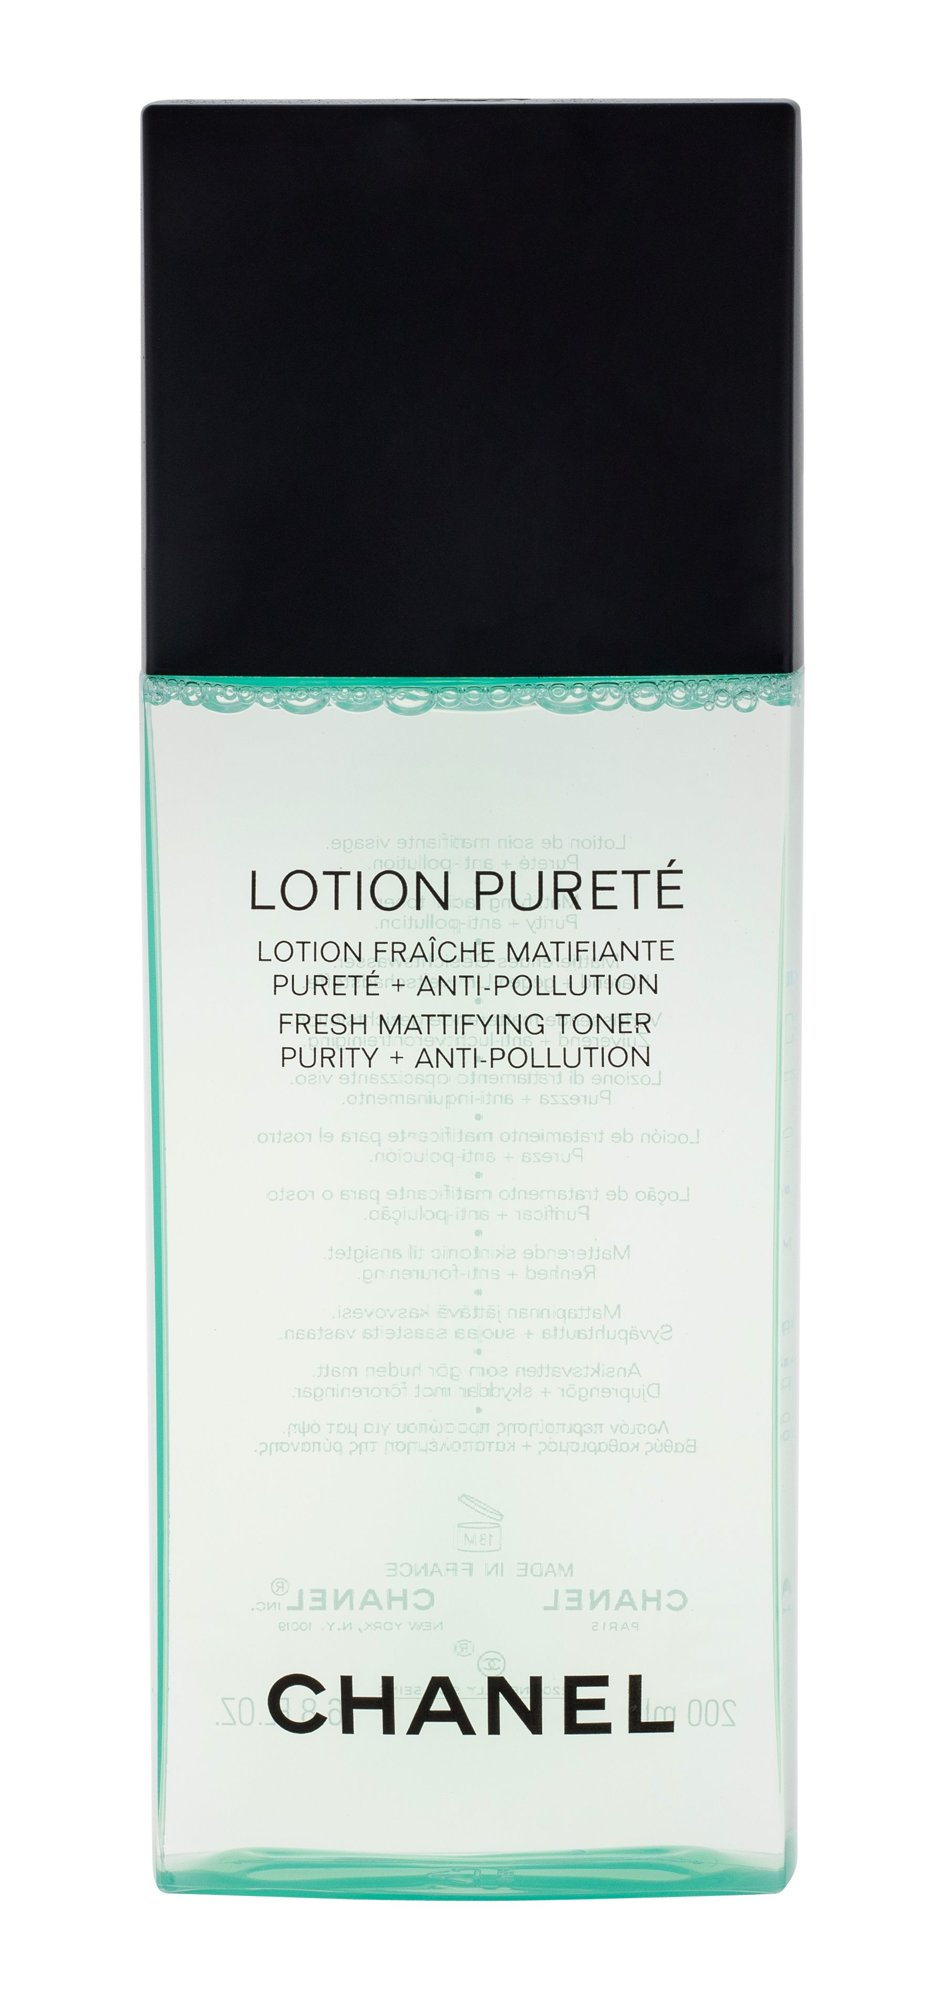 Chanel Lotion Pureté Cosmetic 200ml